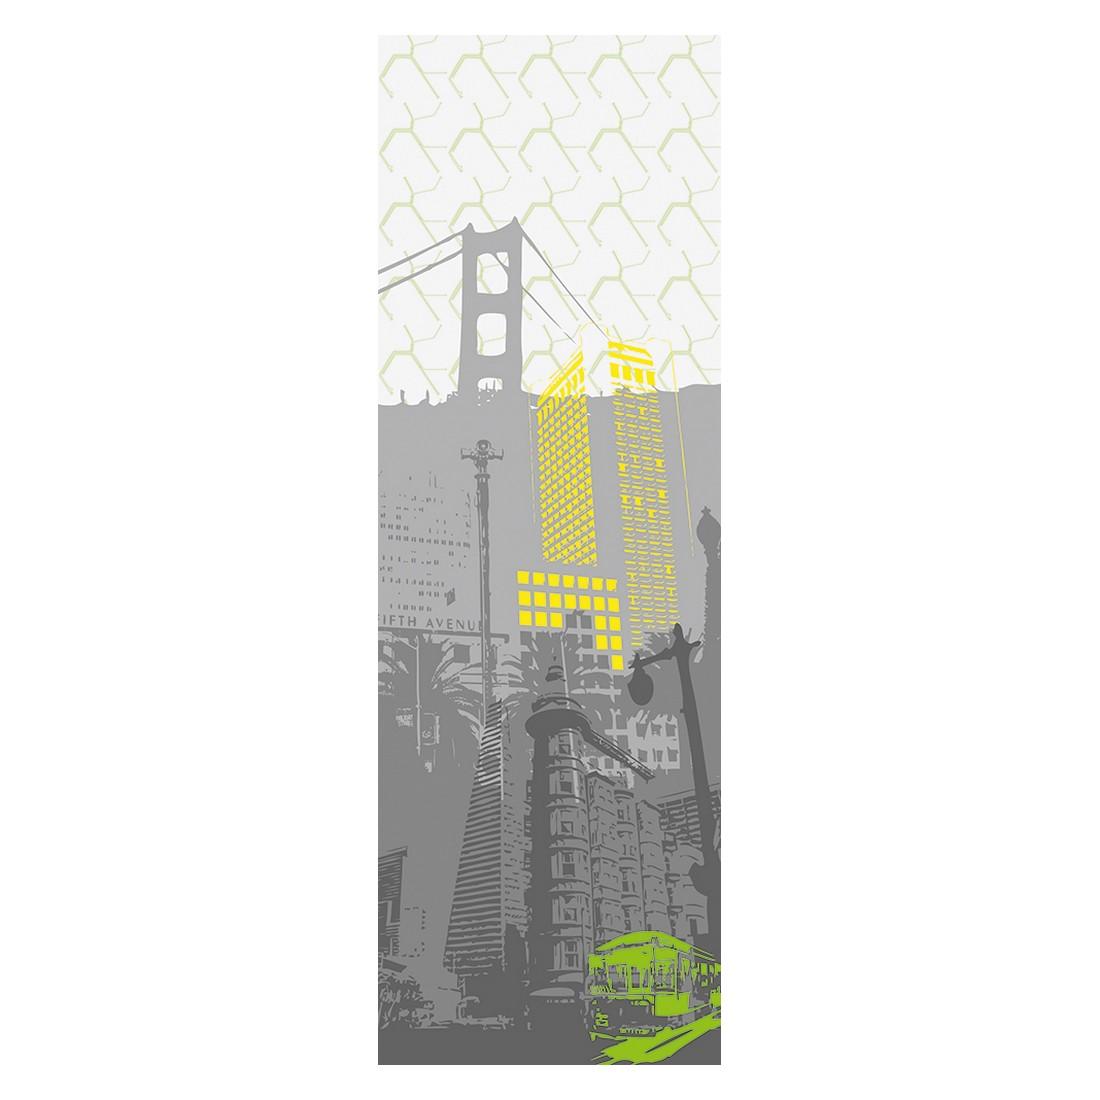 Decopanel San Francisco – grau, weiß, gelb, grün – glatt, Architects Paper günstig kaufen